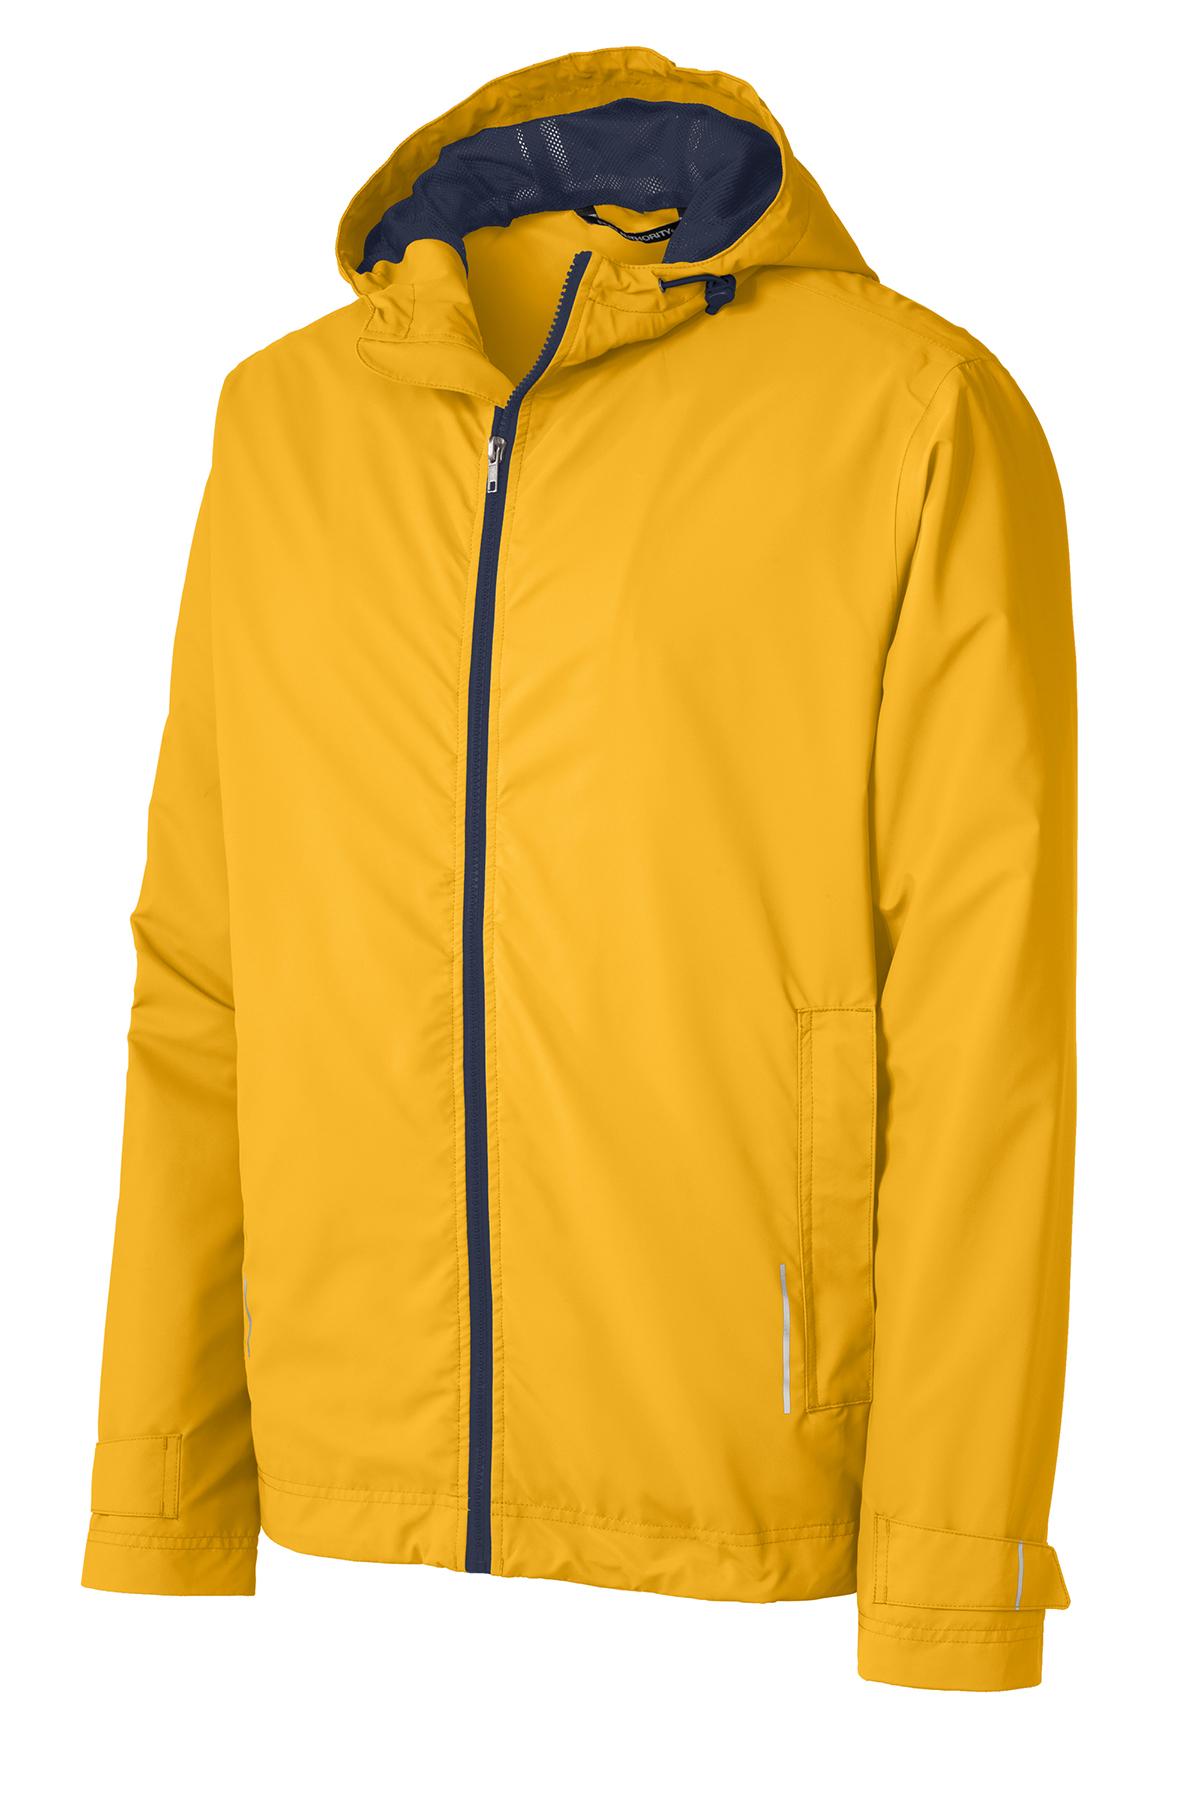 5226406fb Port Authority® Northwest Slicker   Rainwear   Outerwear   SanMar